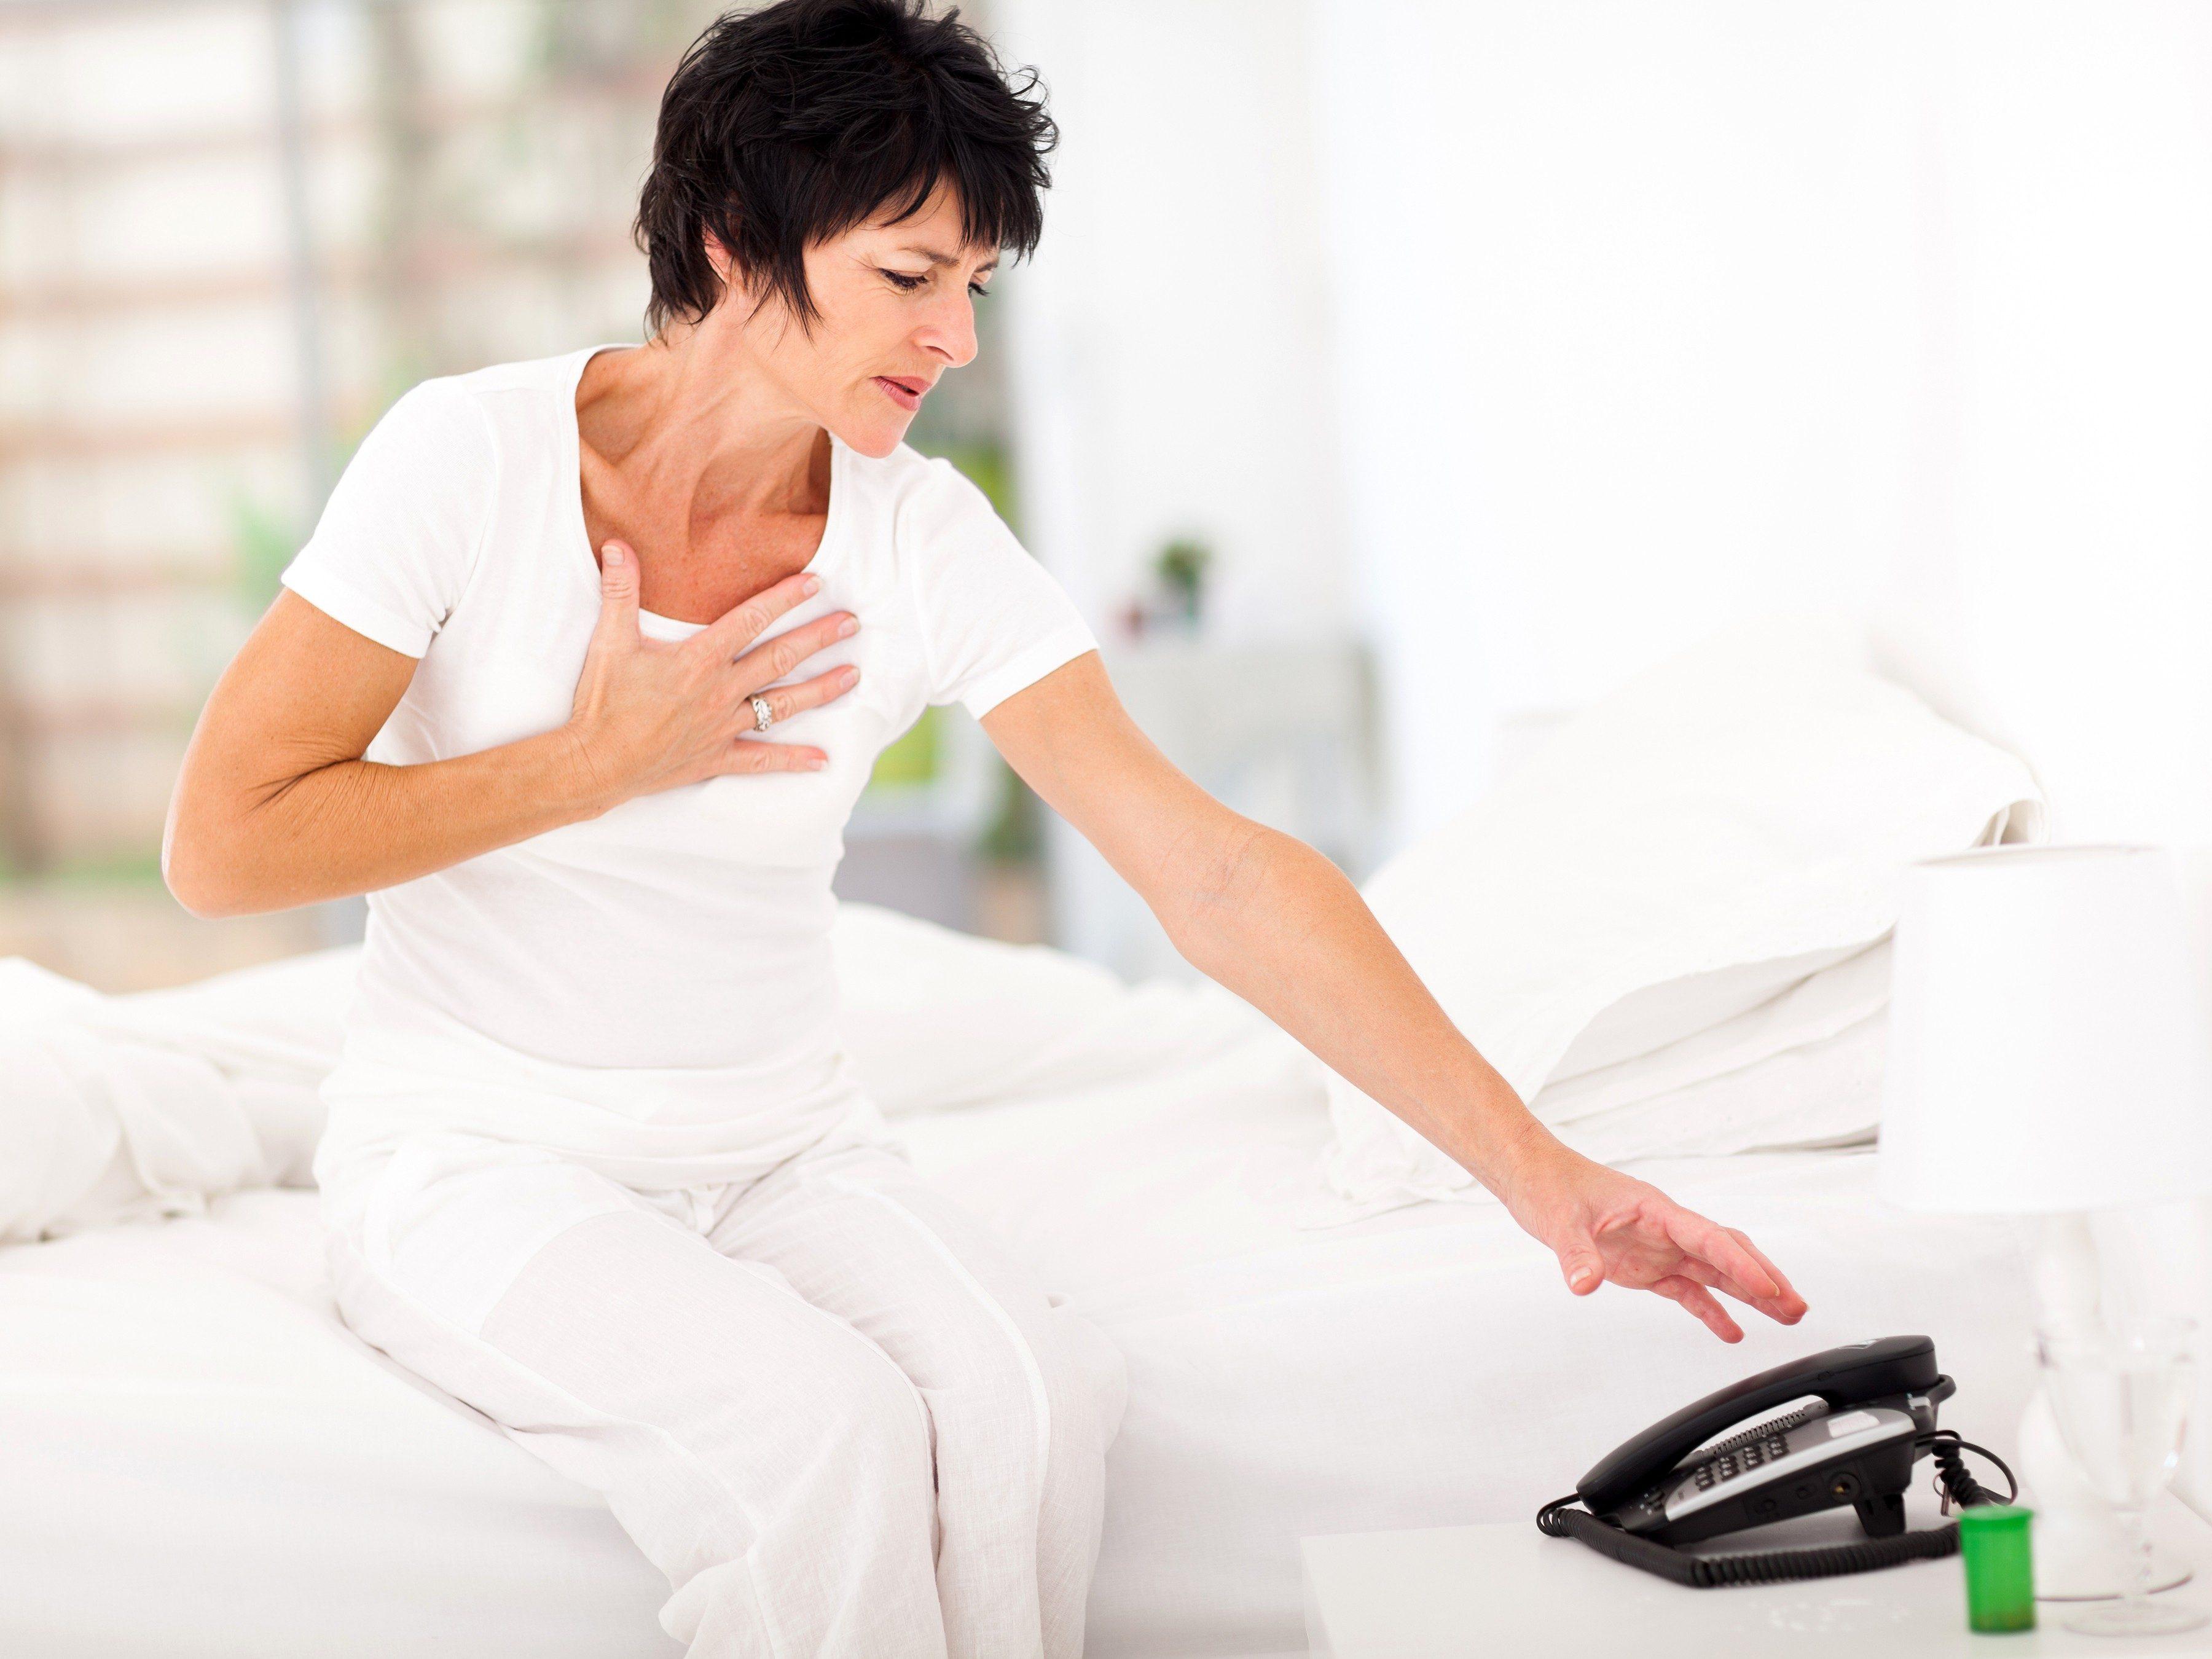 What Does Heartburn Feel Like?